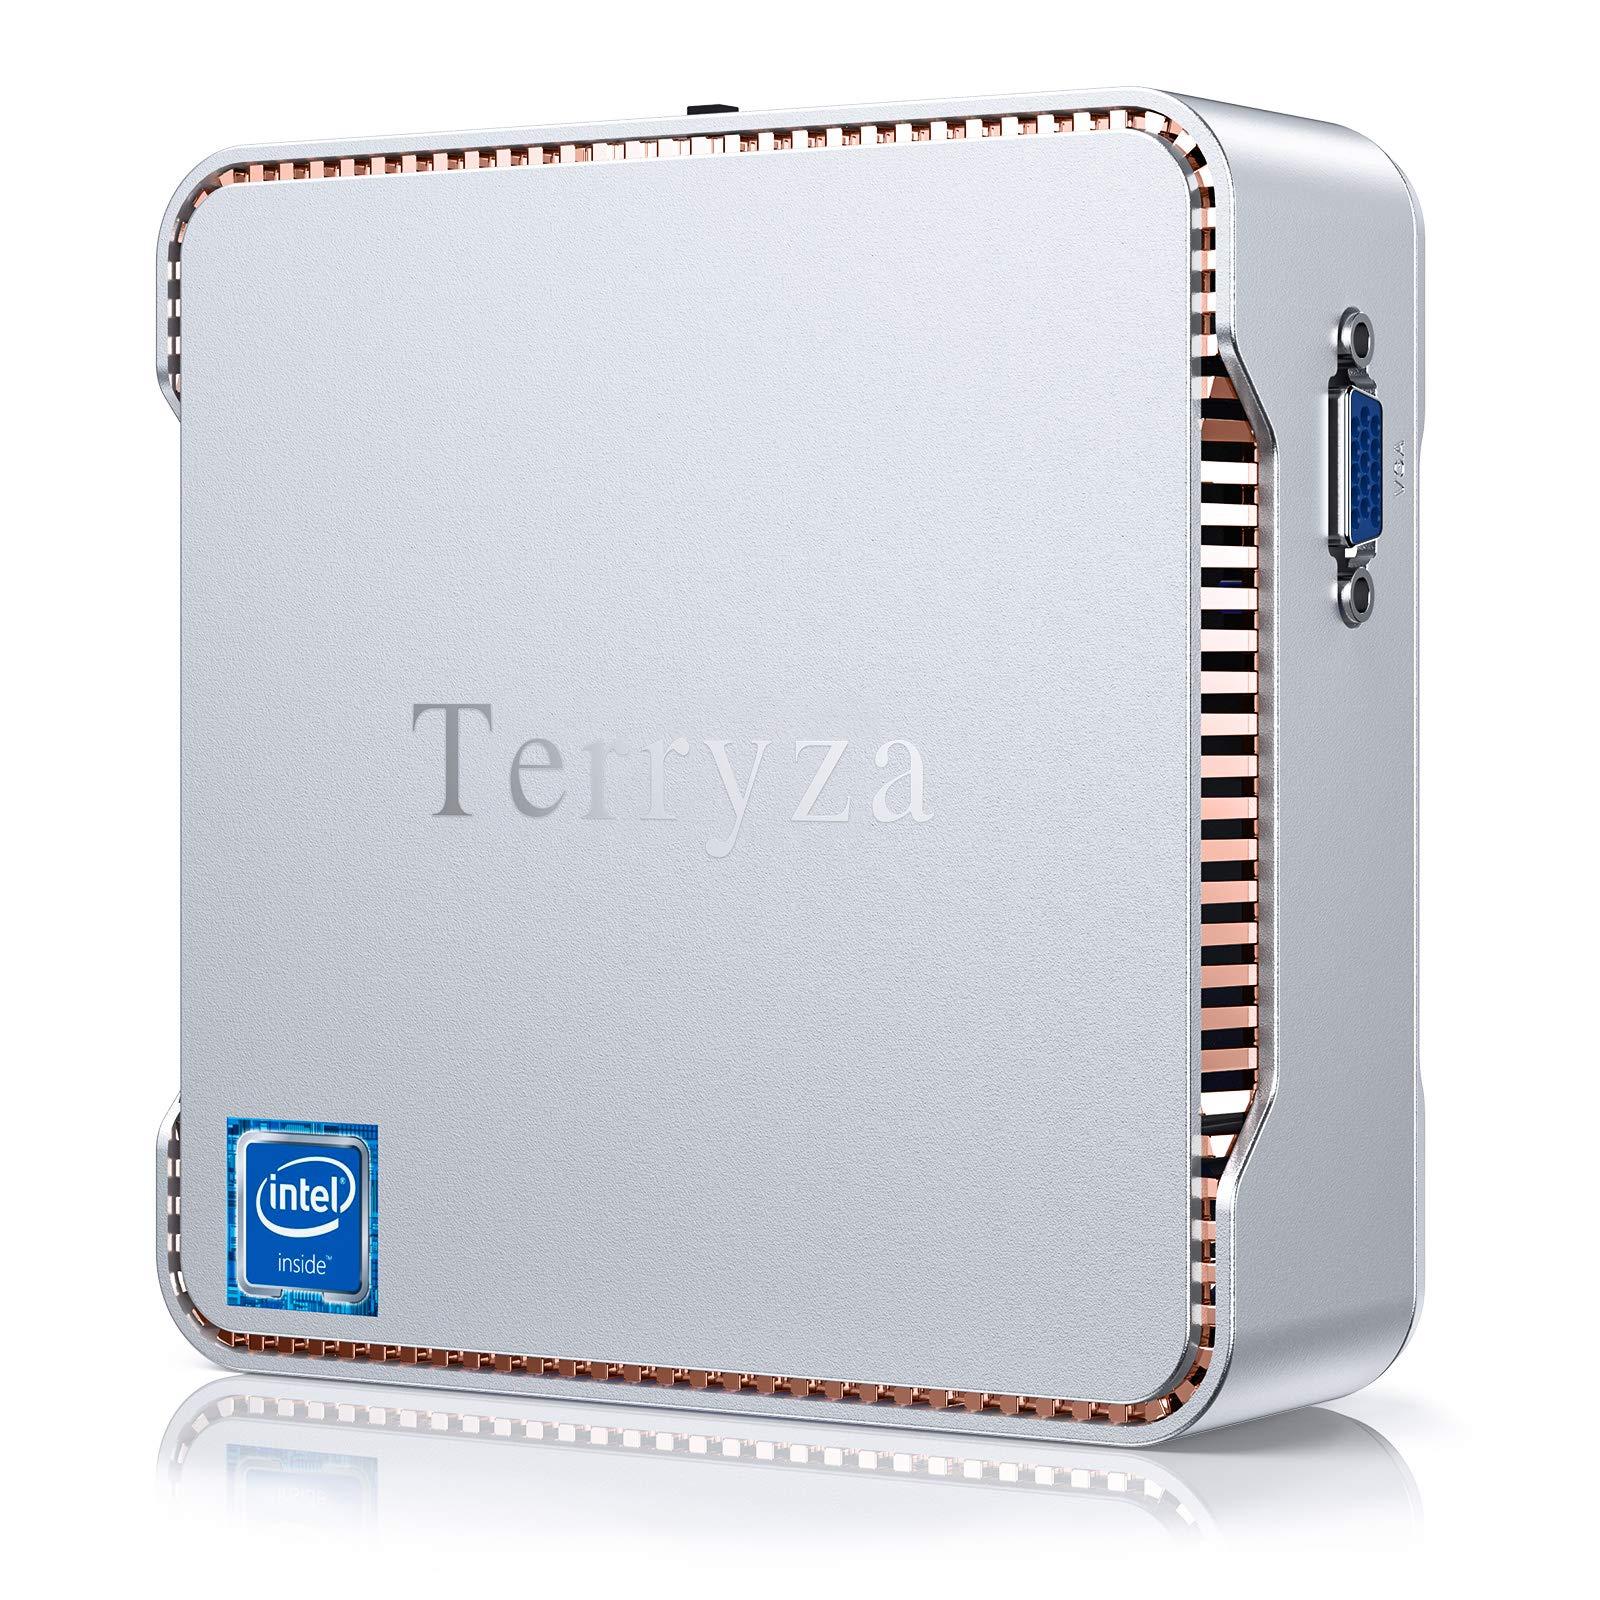 Mini PC 8GB RAM /128GB SSD Intel Celeron N3350 (up to 2.4GHz) Mini Desktop PC,Support 4K HD, Dual Band Wi-Fi 2.4G/5G,Gigabit Ethernet,HDMI/VGA Port Multi-Display, BT 4.2